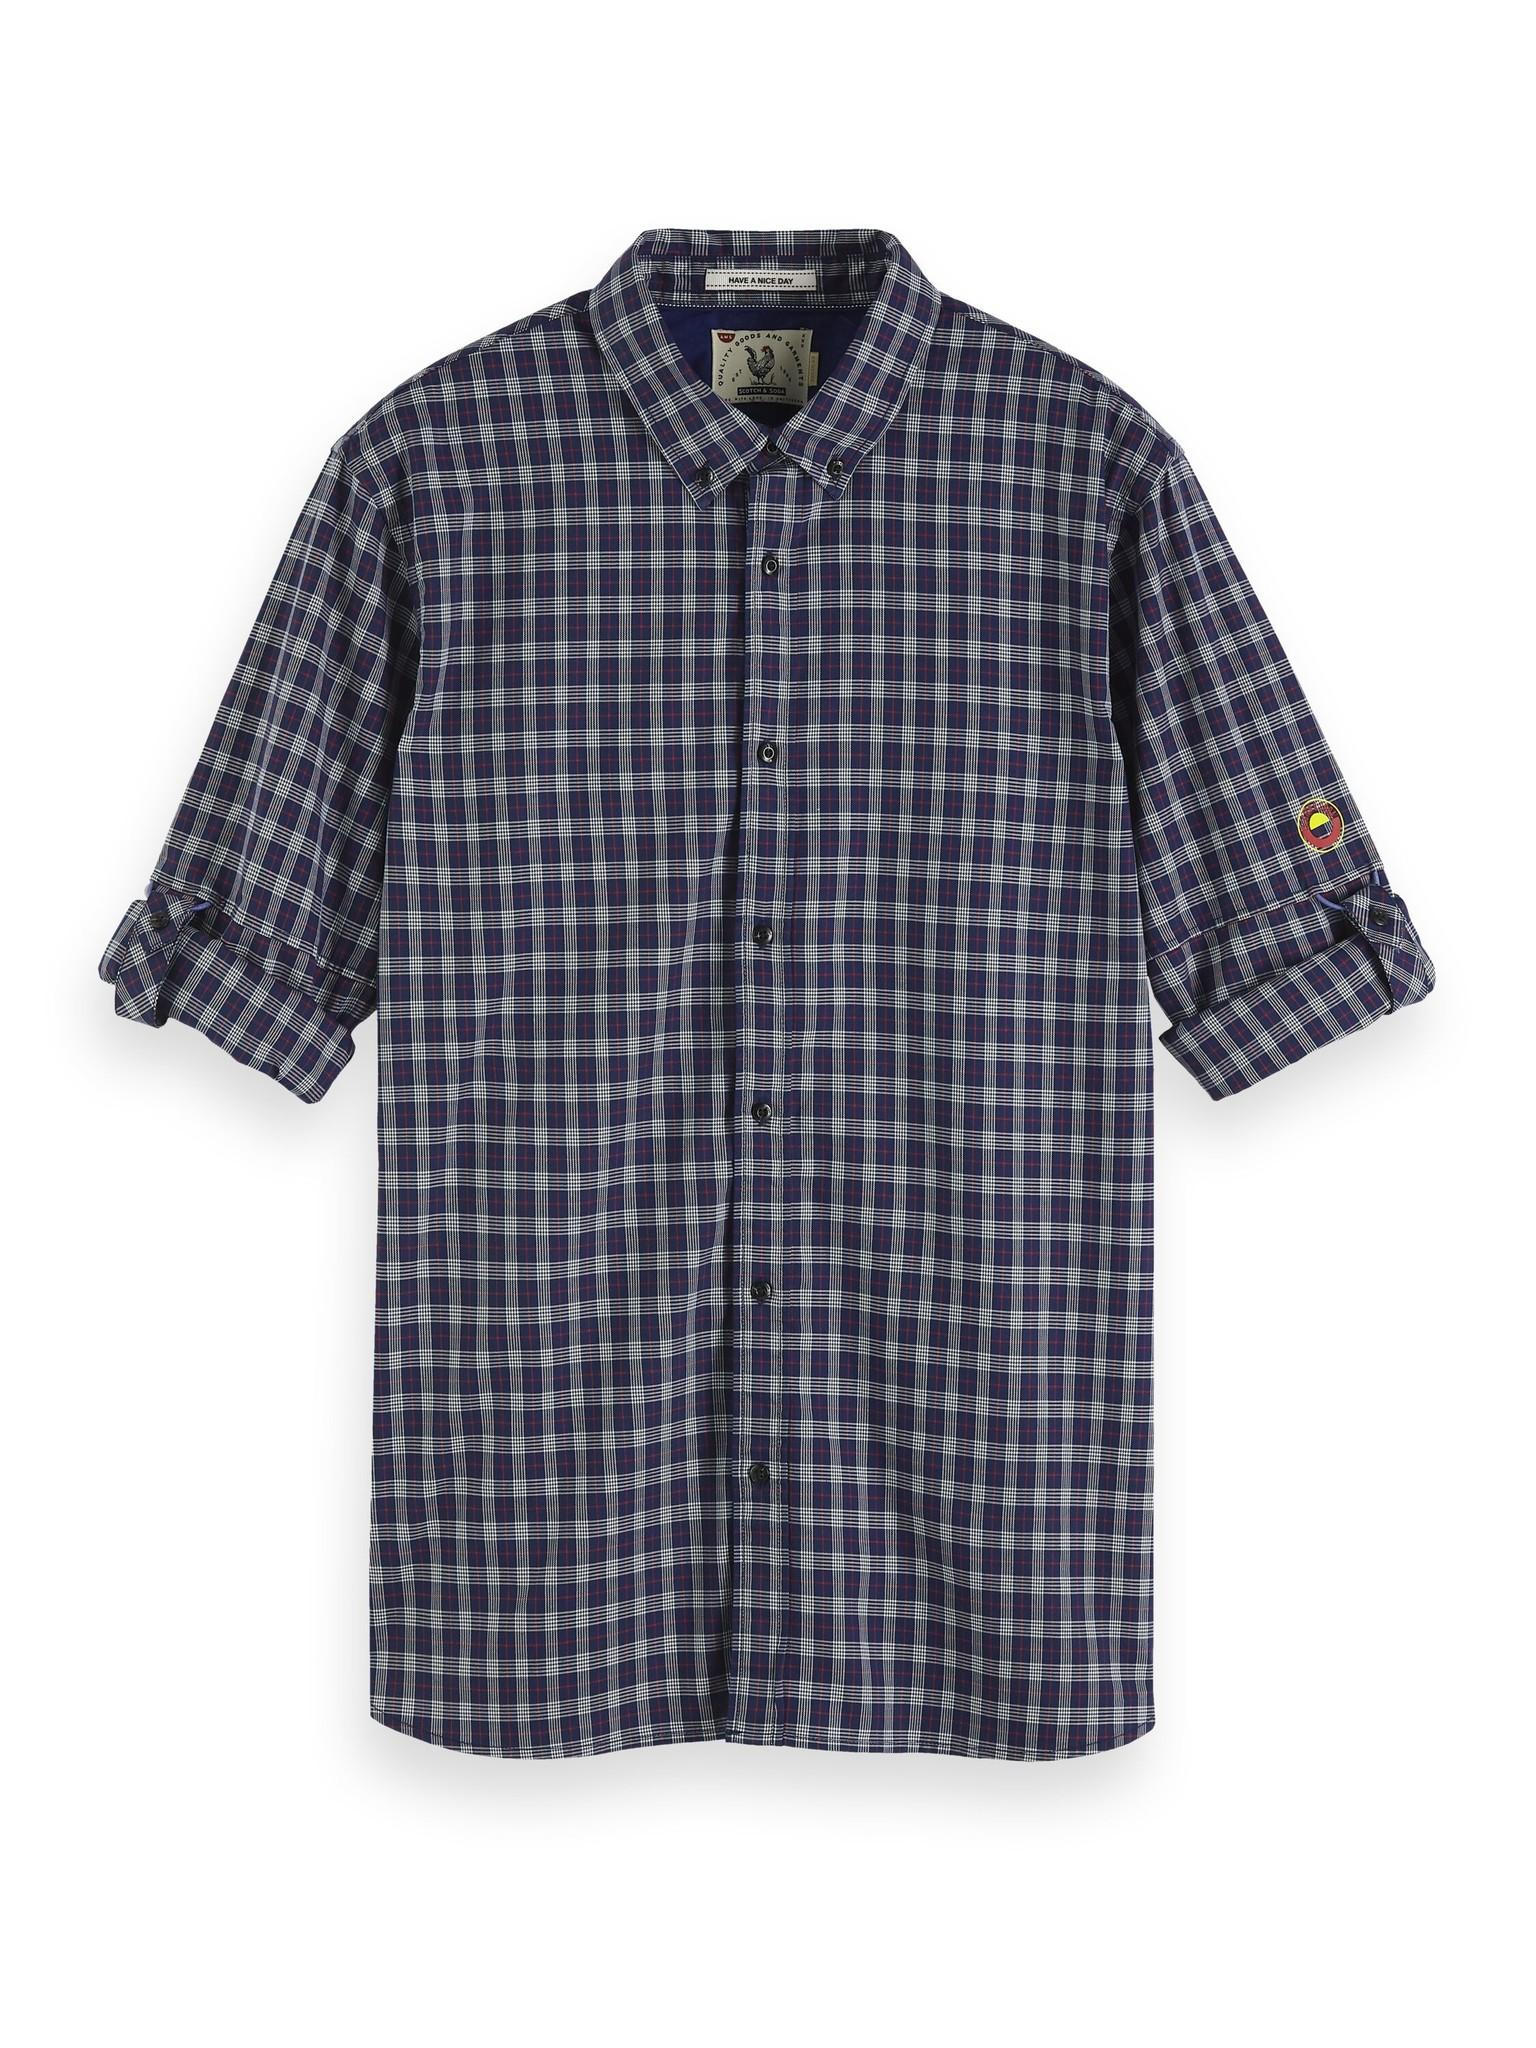 Scotch & Soda Regular Check Shirt   152158